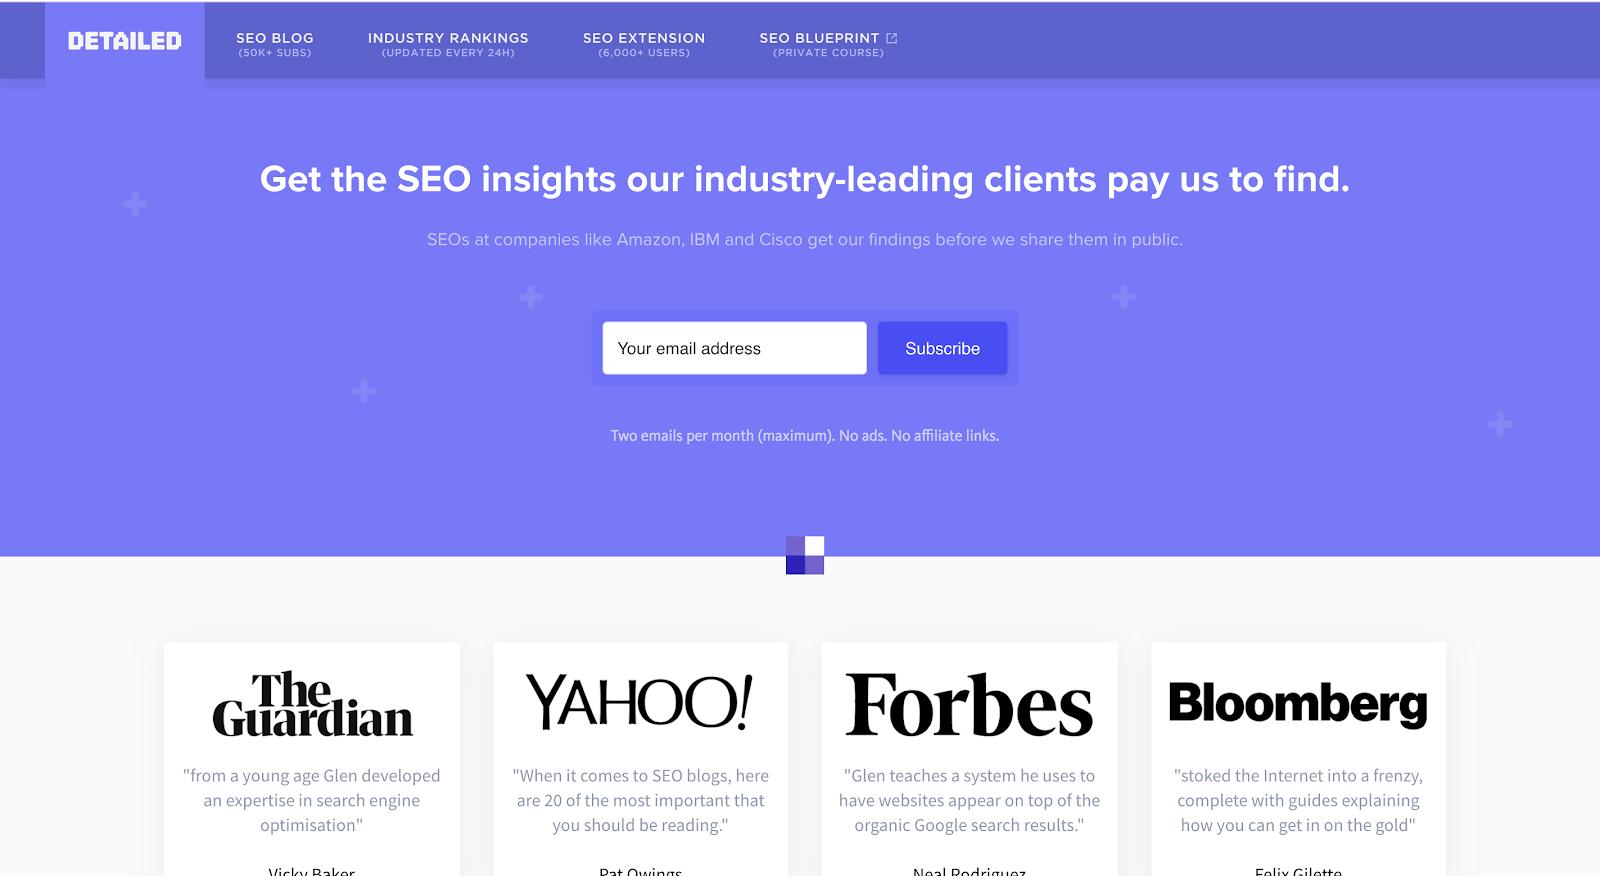 Detailed SEO Website Homepage Screenshot (Blog Layout Examples)